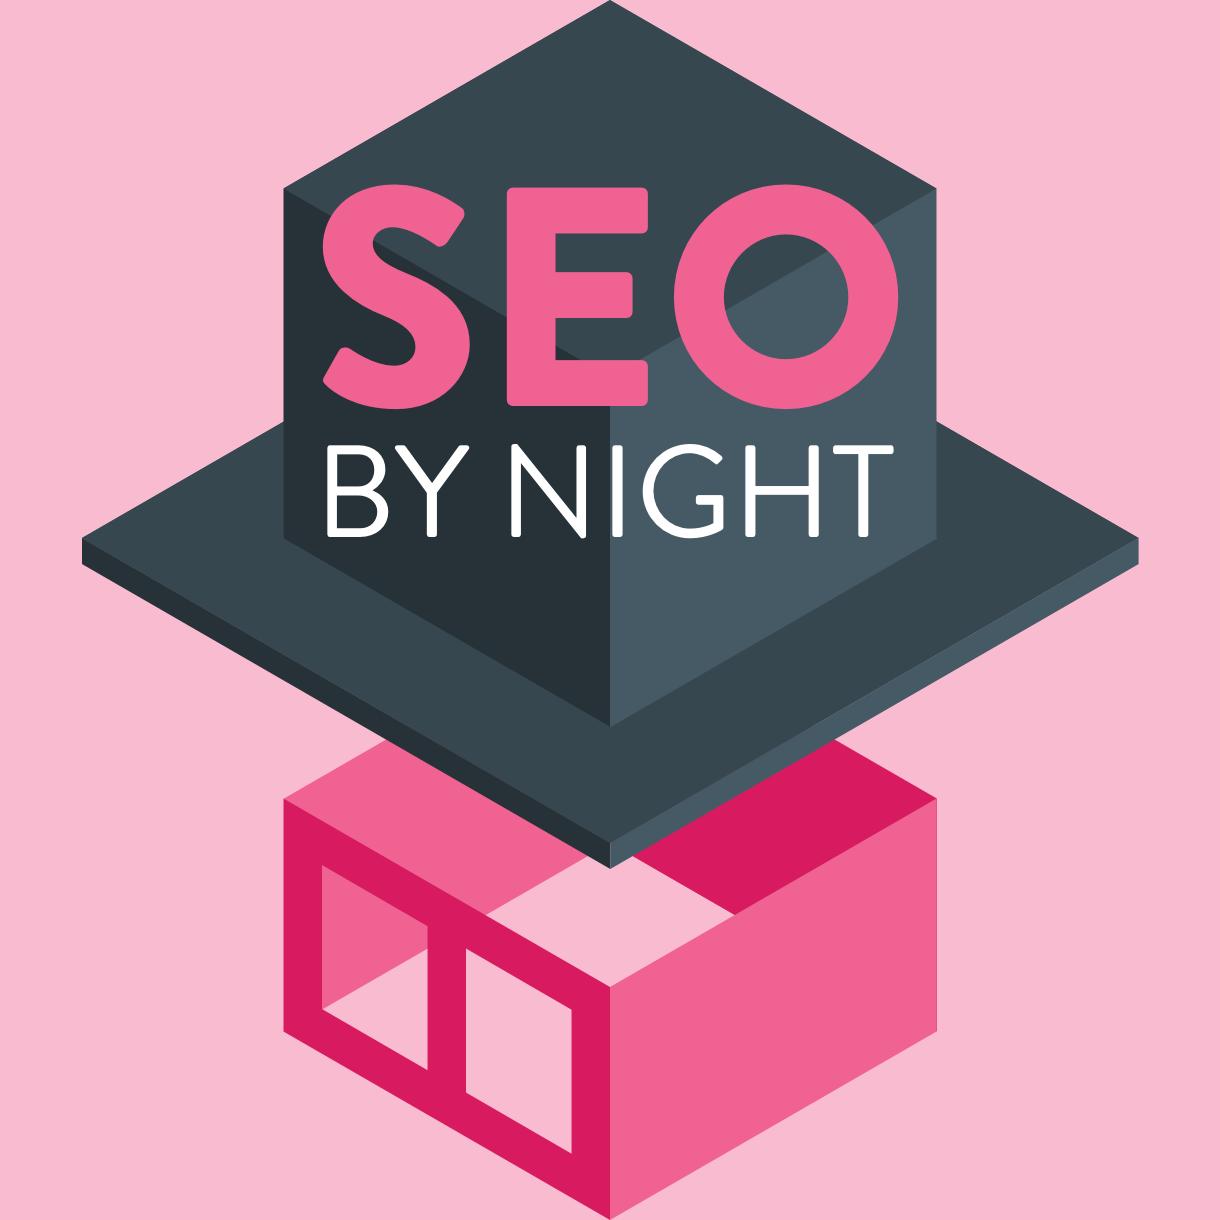 logo seo by night